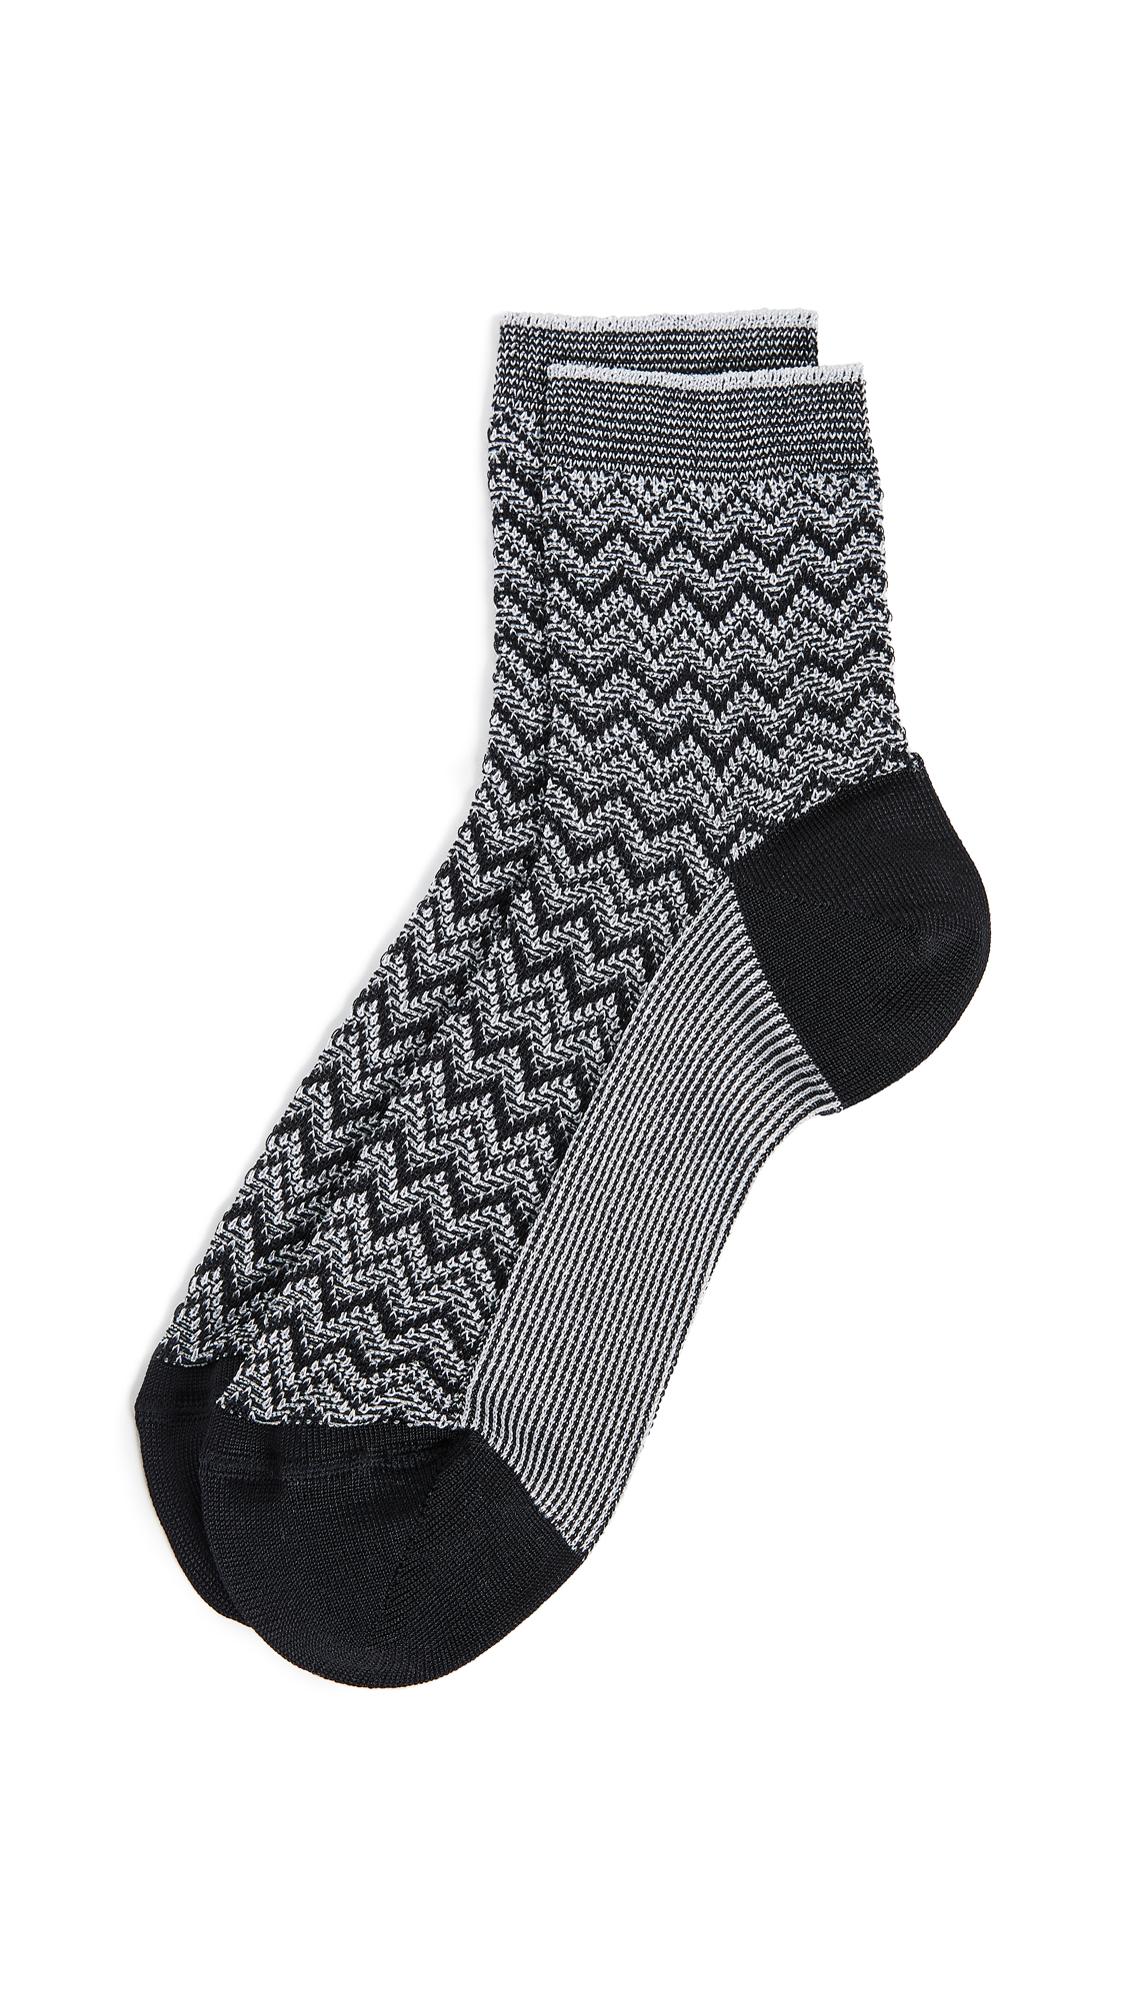 Missoni Short Socks - Silver